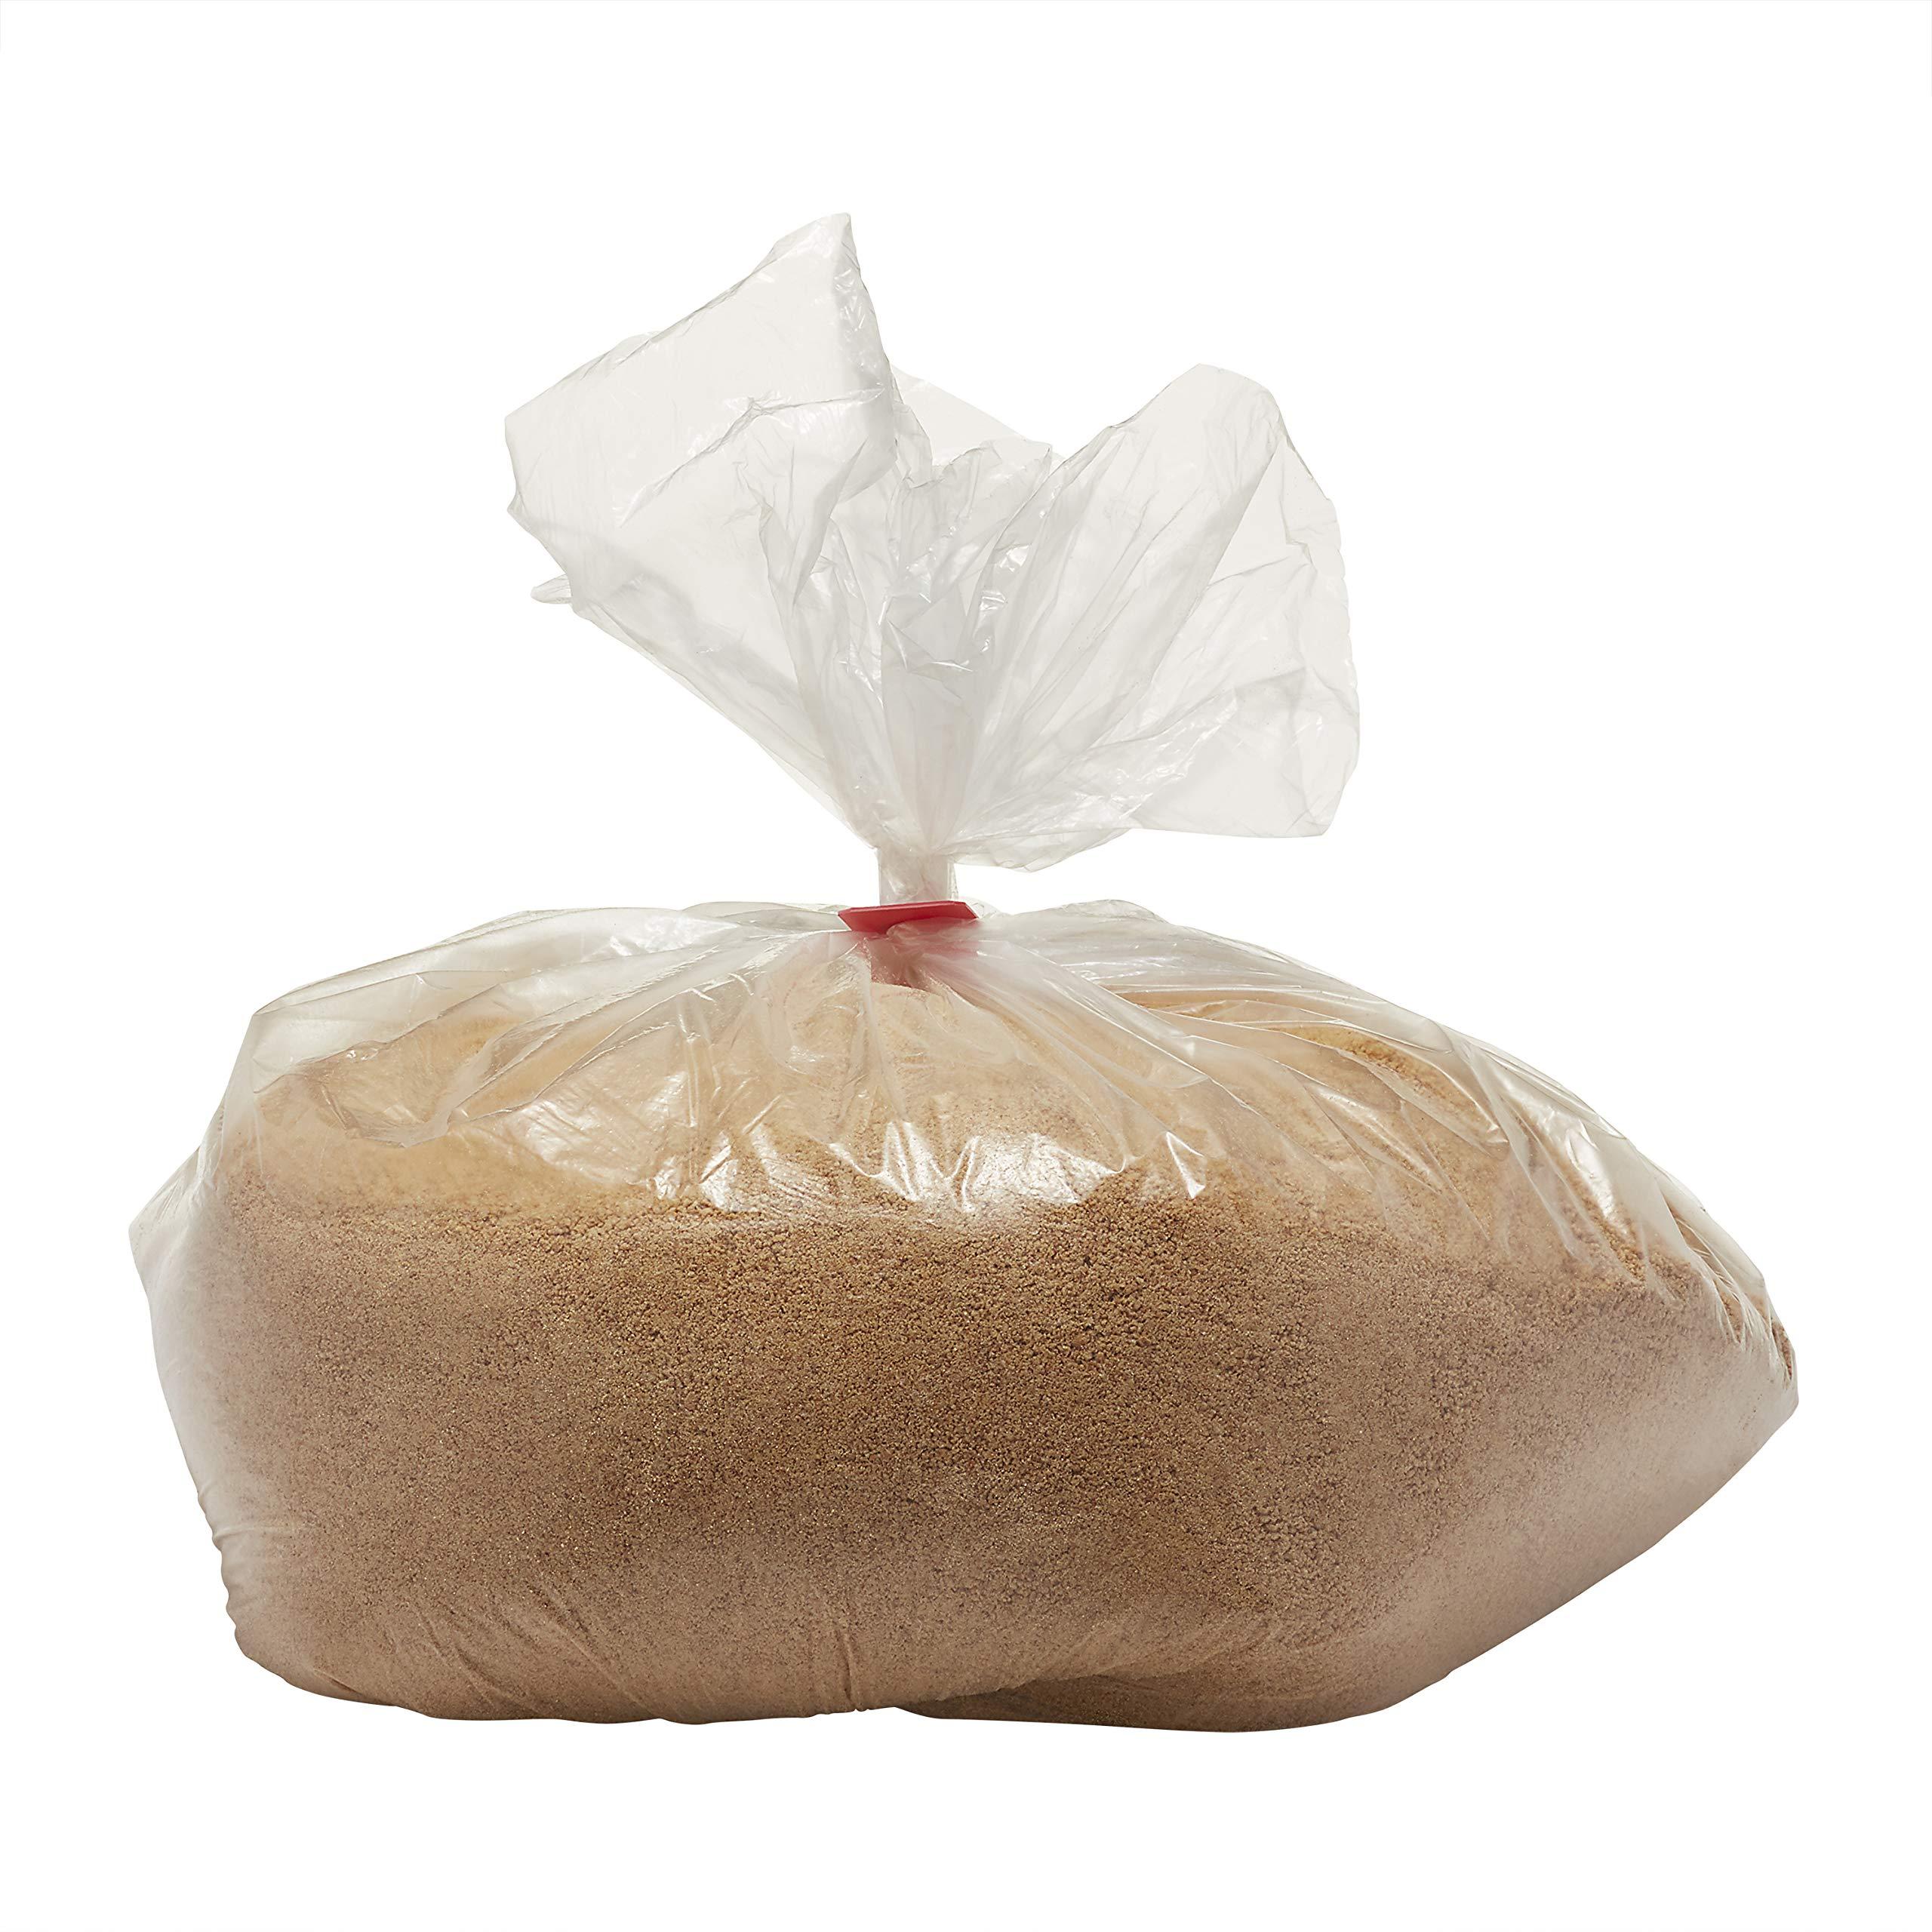 Keebler Graham Cracker Crumbs, 25 Pound by Keebler (Image #3)